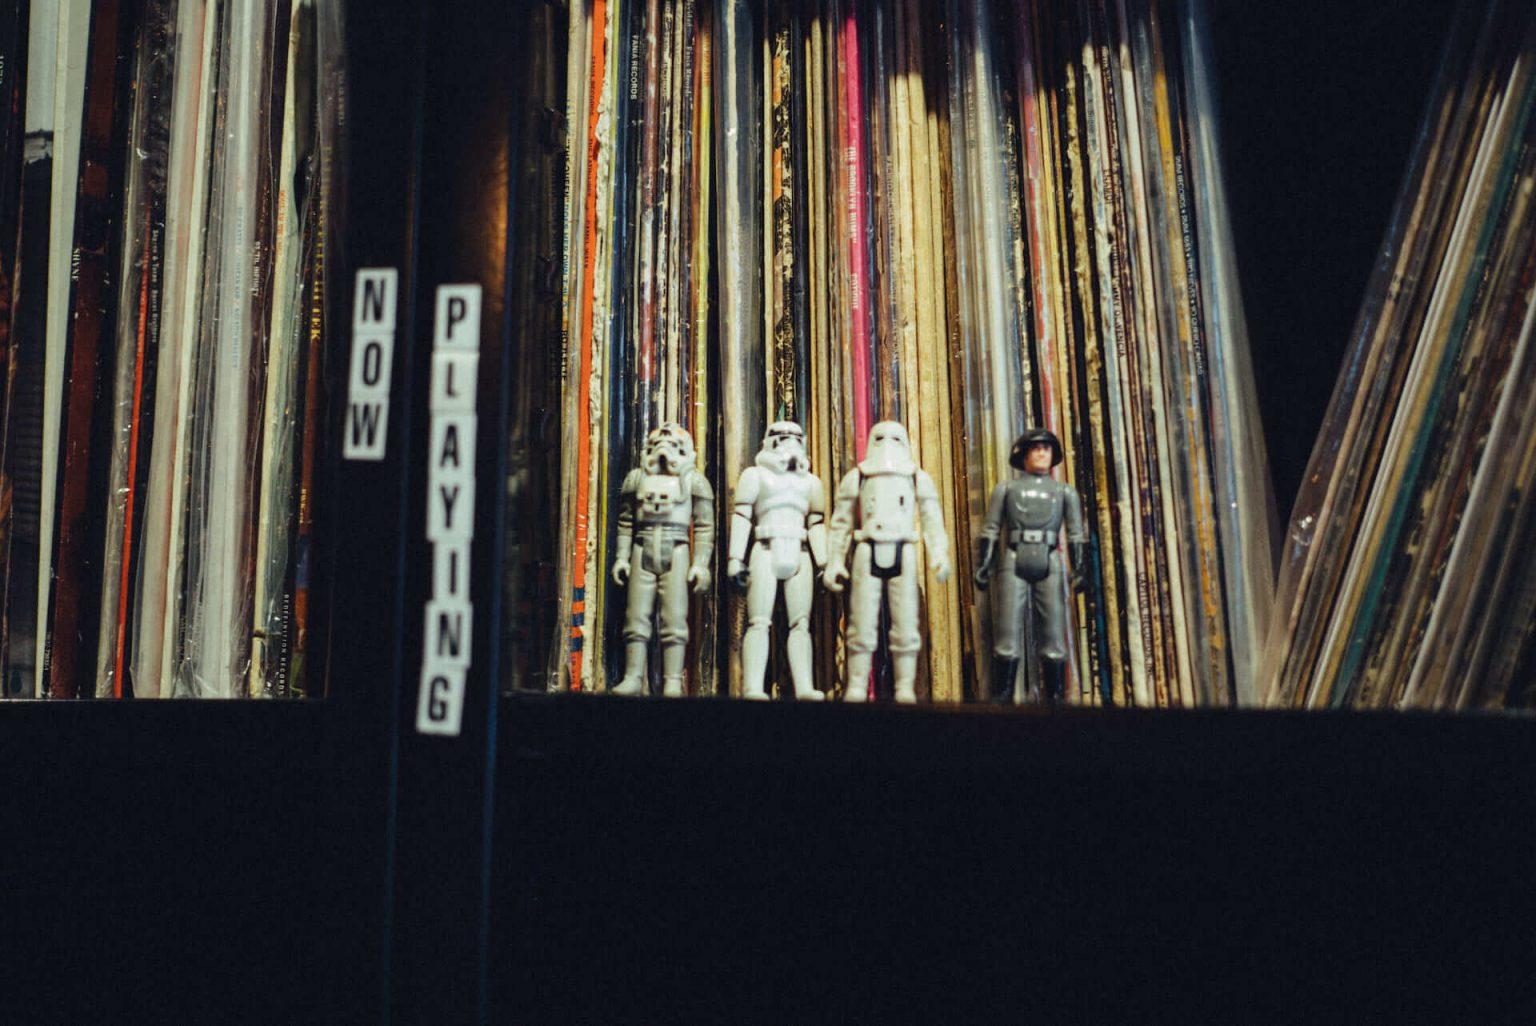 "11_3320_AT_Greenwayrecords-1440x962 アナログレコード専門レーベル「Greenway Records」オーナーの""打ち合わせ場所、アイデアの棚、息抜きドーナツ屋、最近のベニュー"""